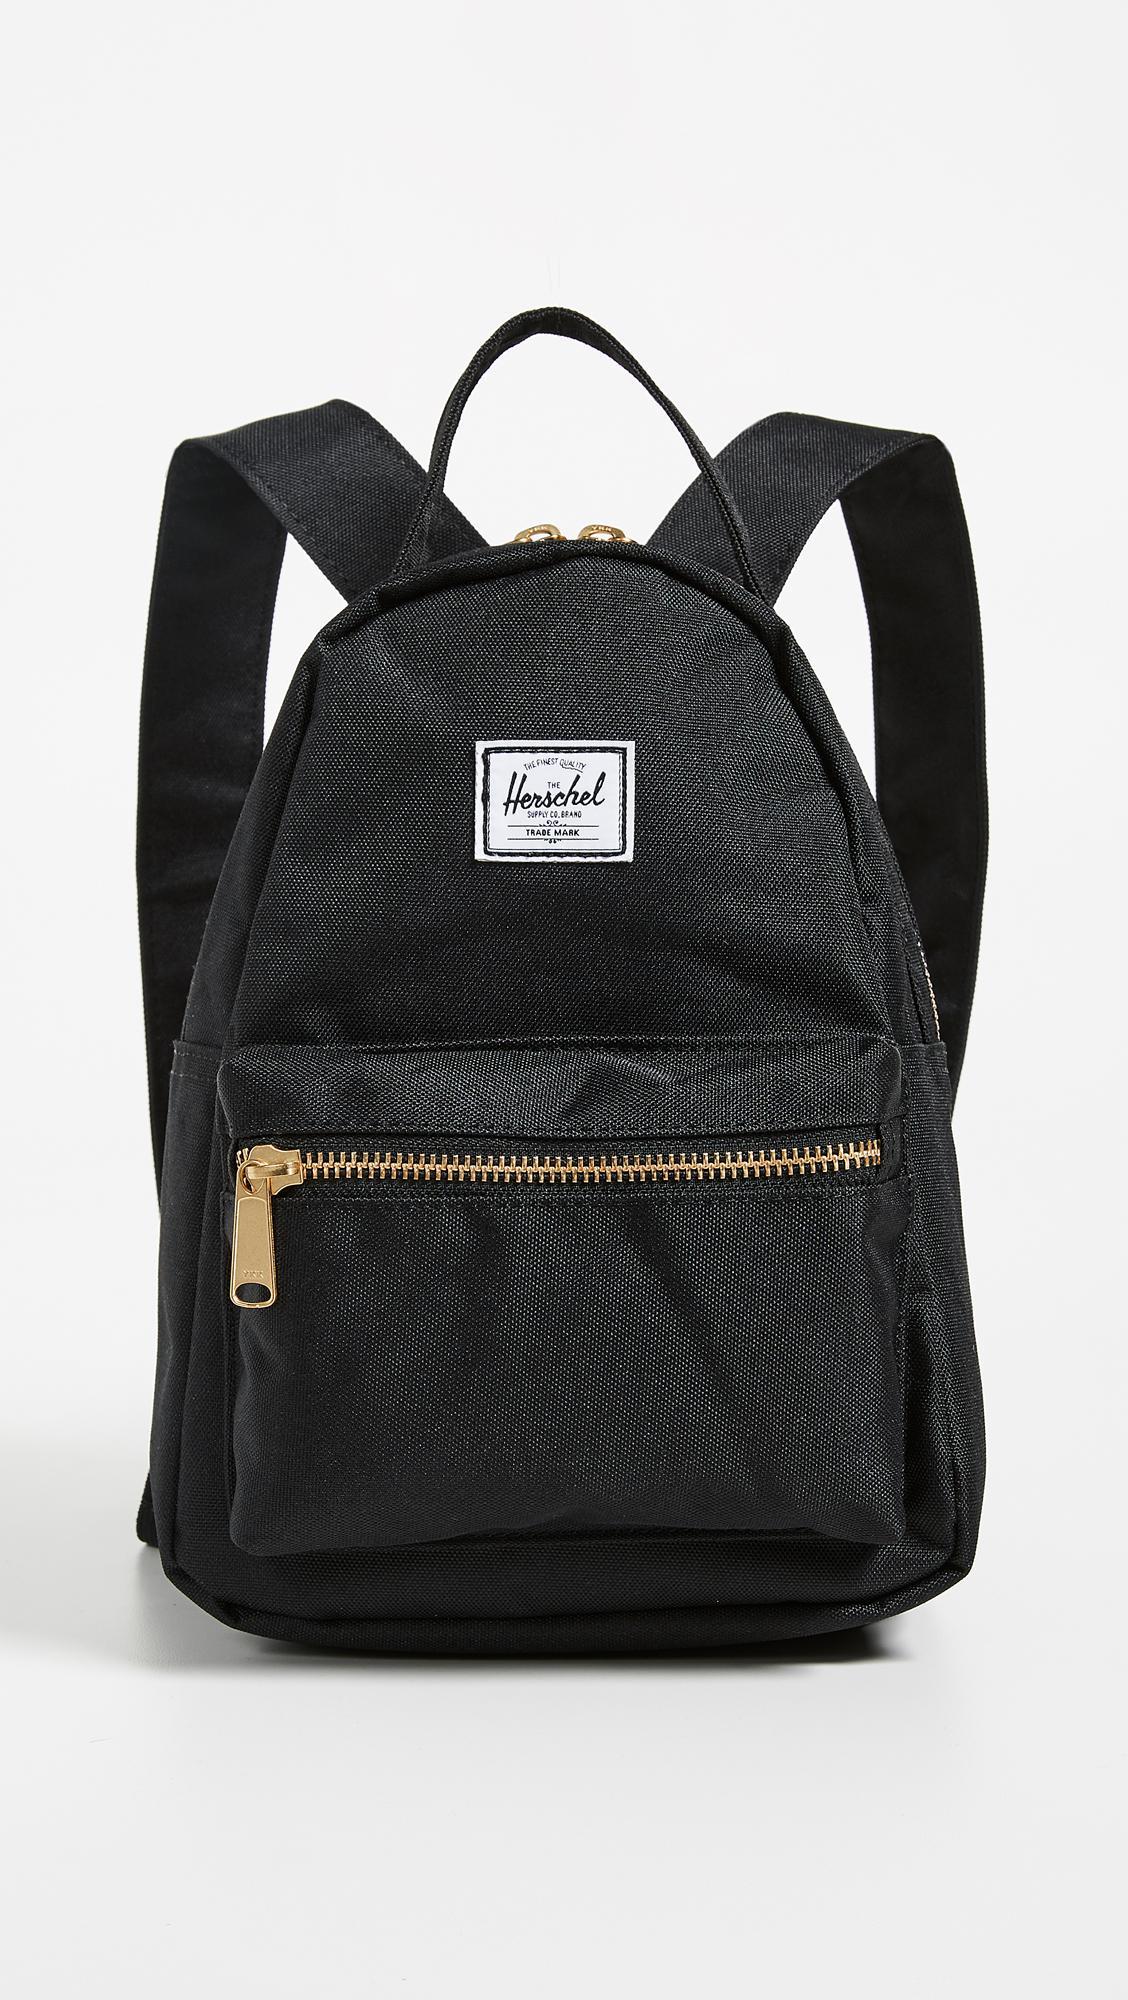 Lyst - Herschel Supply Co. Nova Mini Backpack in Black - Save 30% d69428cfd0